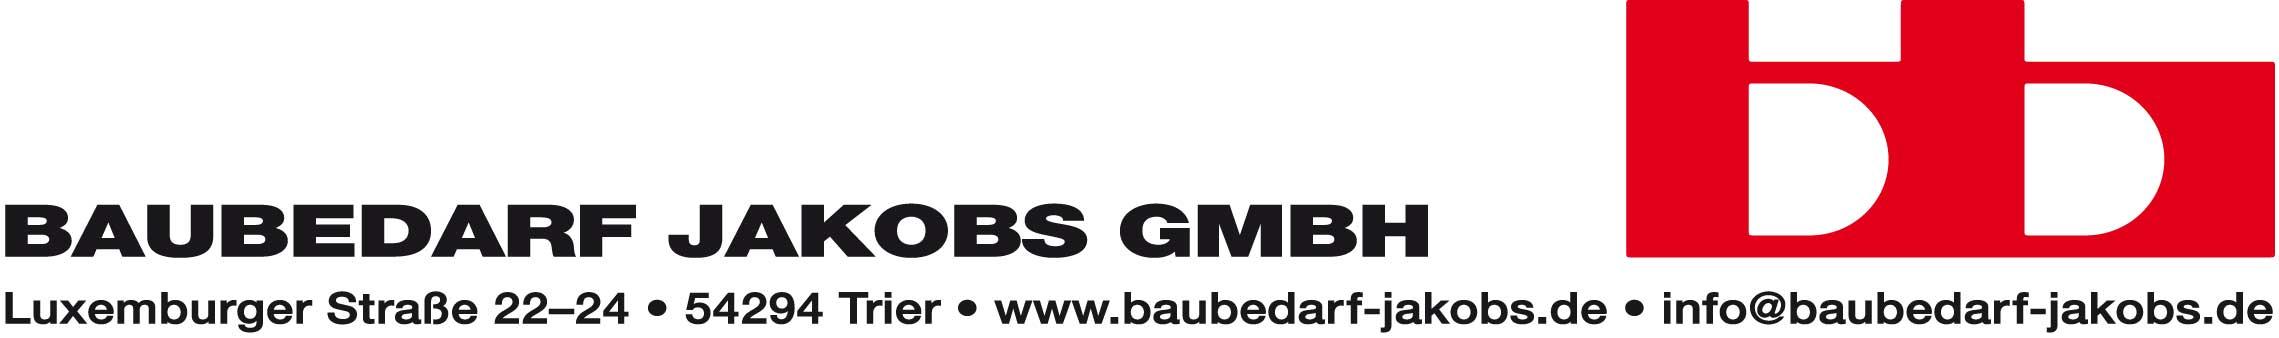 Baubedarf Jakobs GmbH